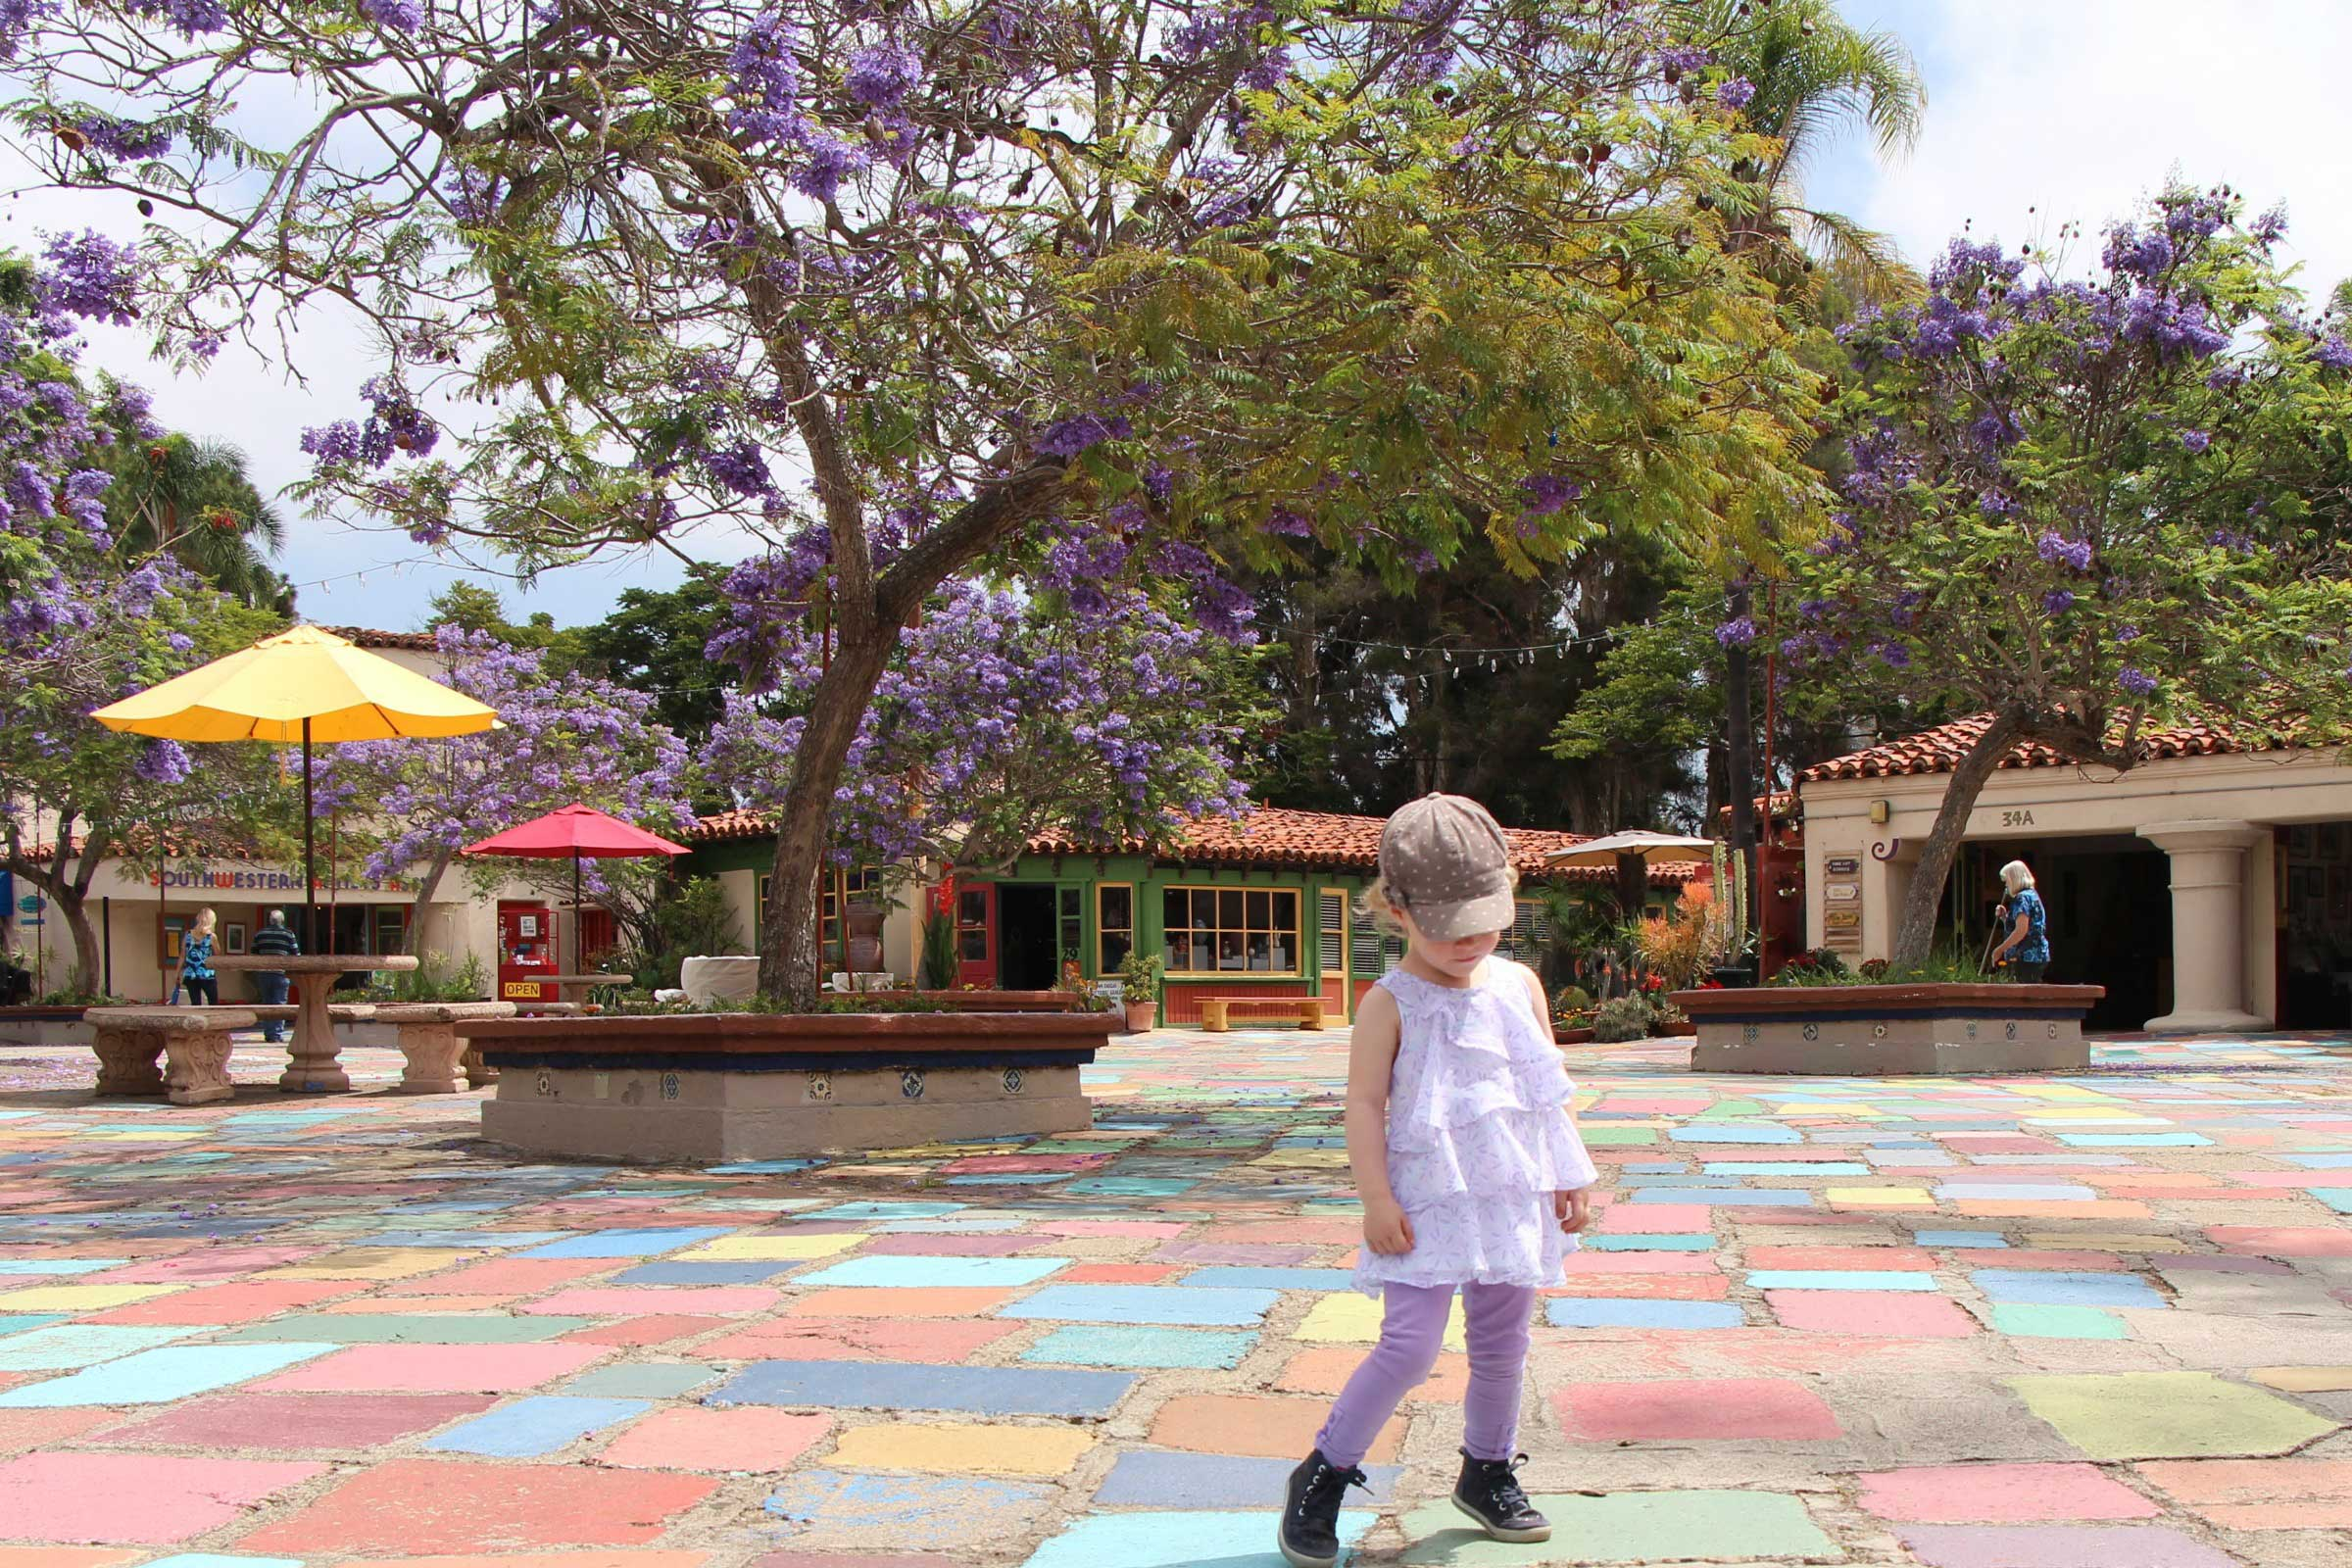 Spanish Art Village Balboa Park San Diego